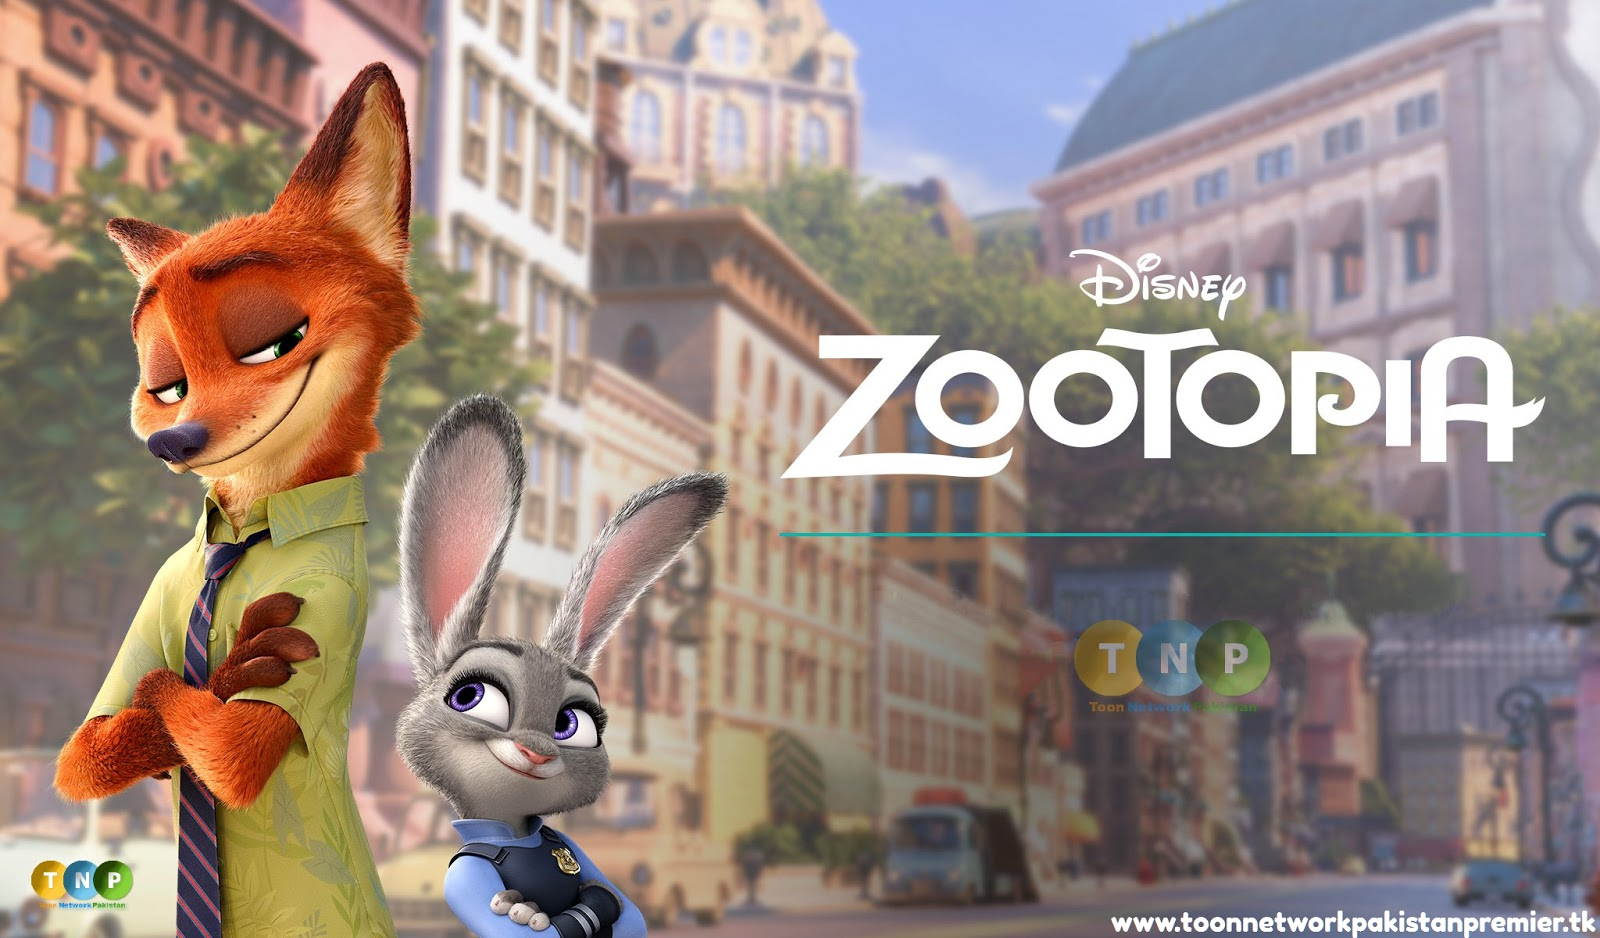 Disney Zootopia Full Movie [Urdu, Hindi - English] (Dual Audio) 1080p Full HD - Toon Network Pakistan